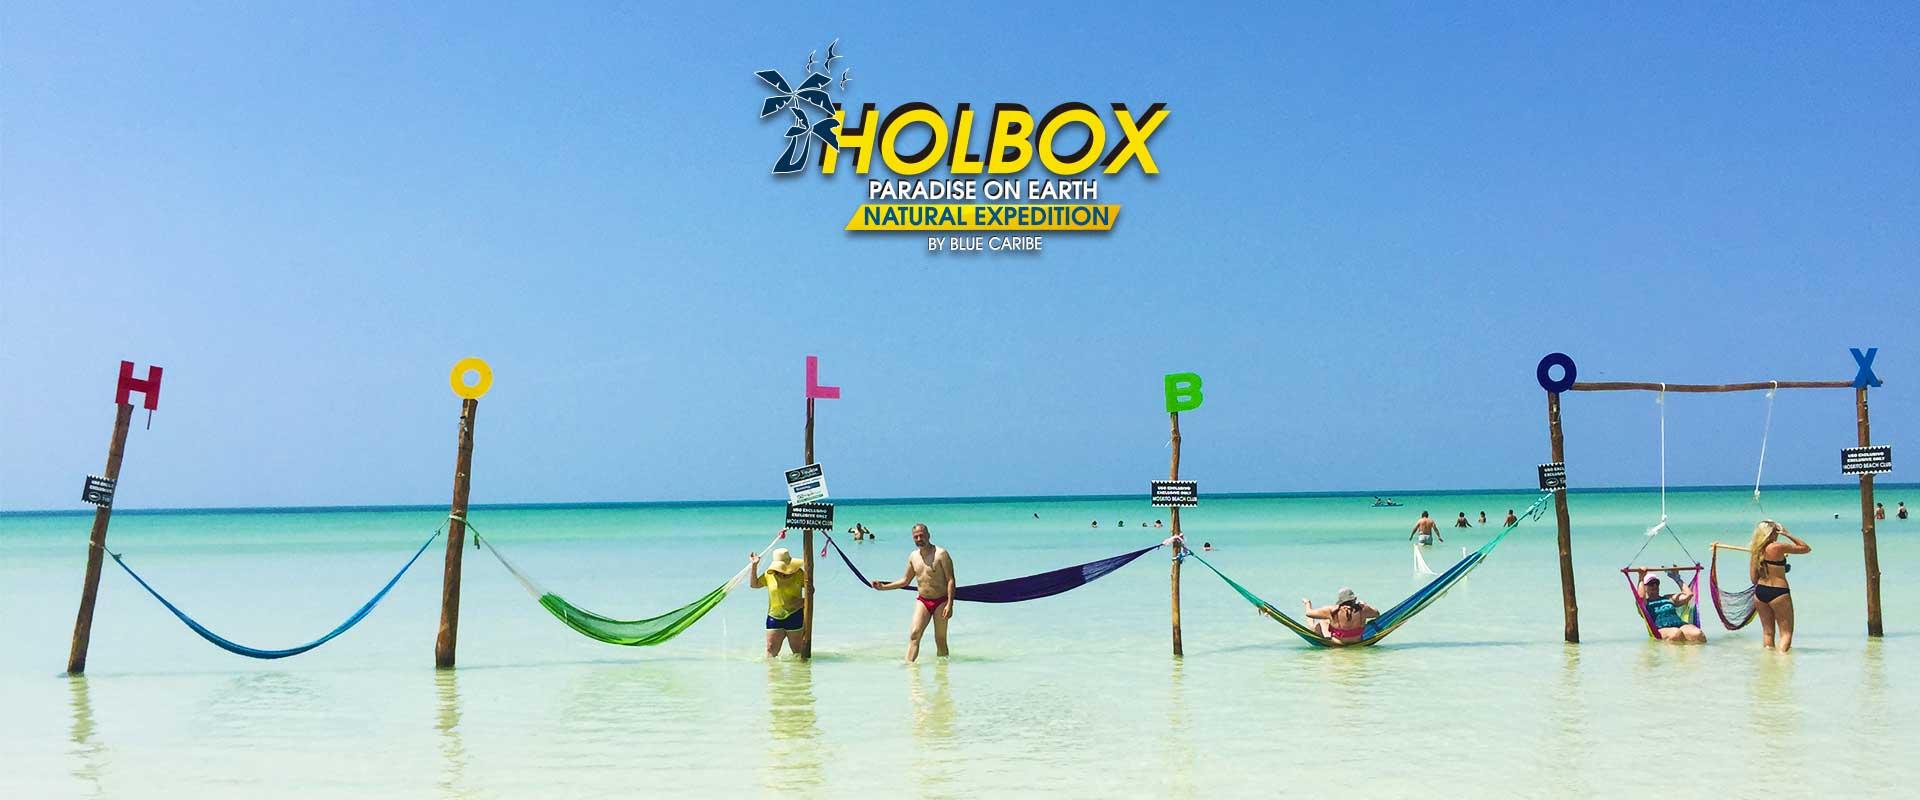 tour holbox